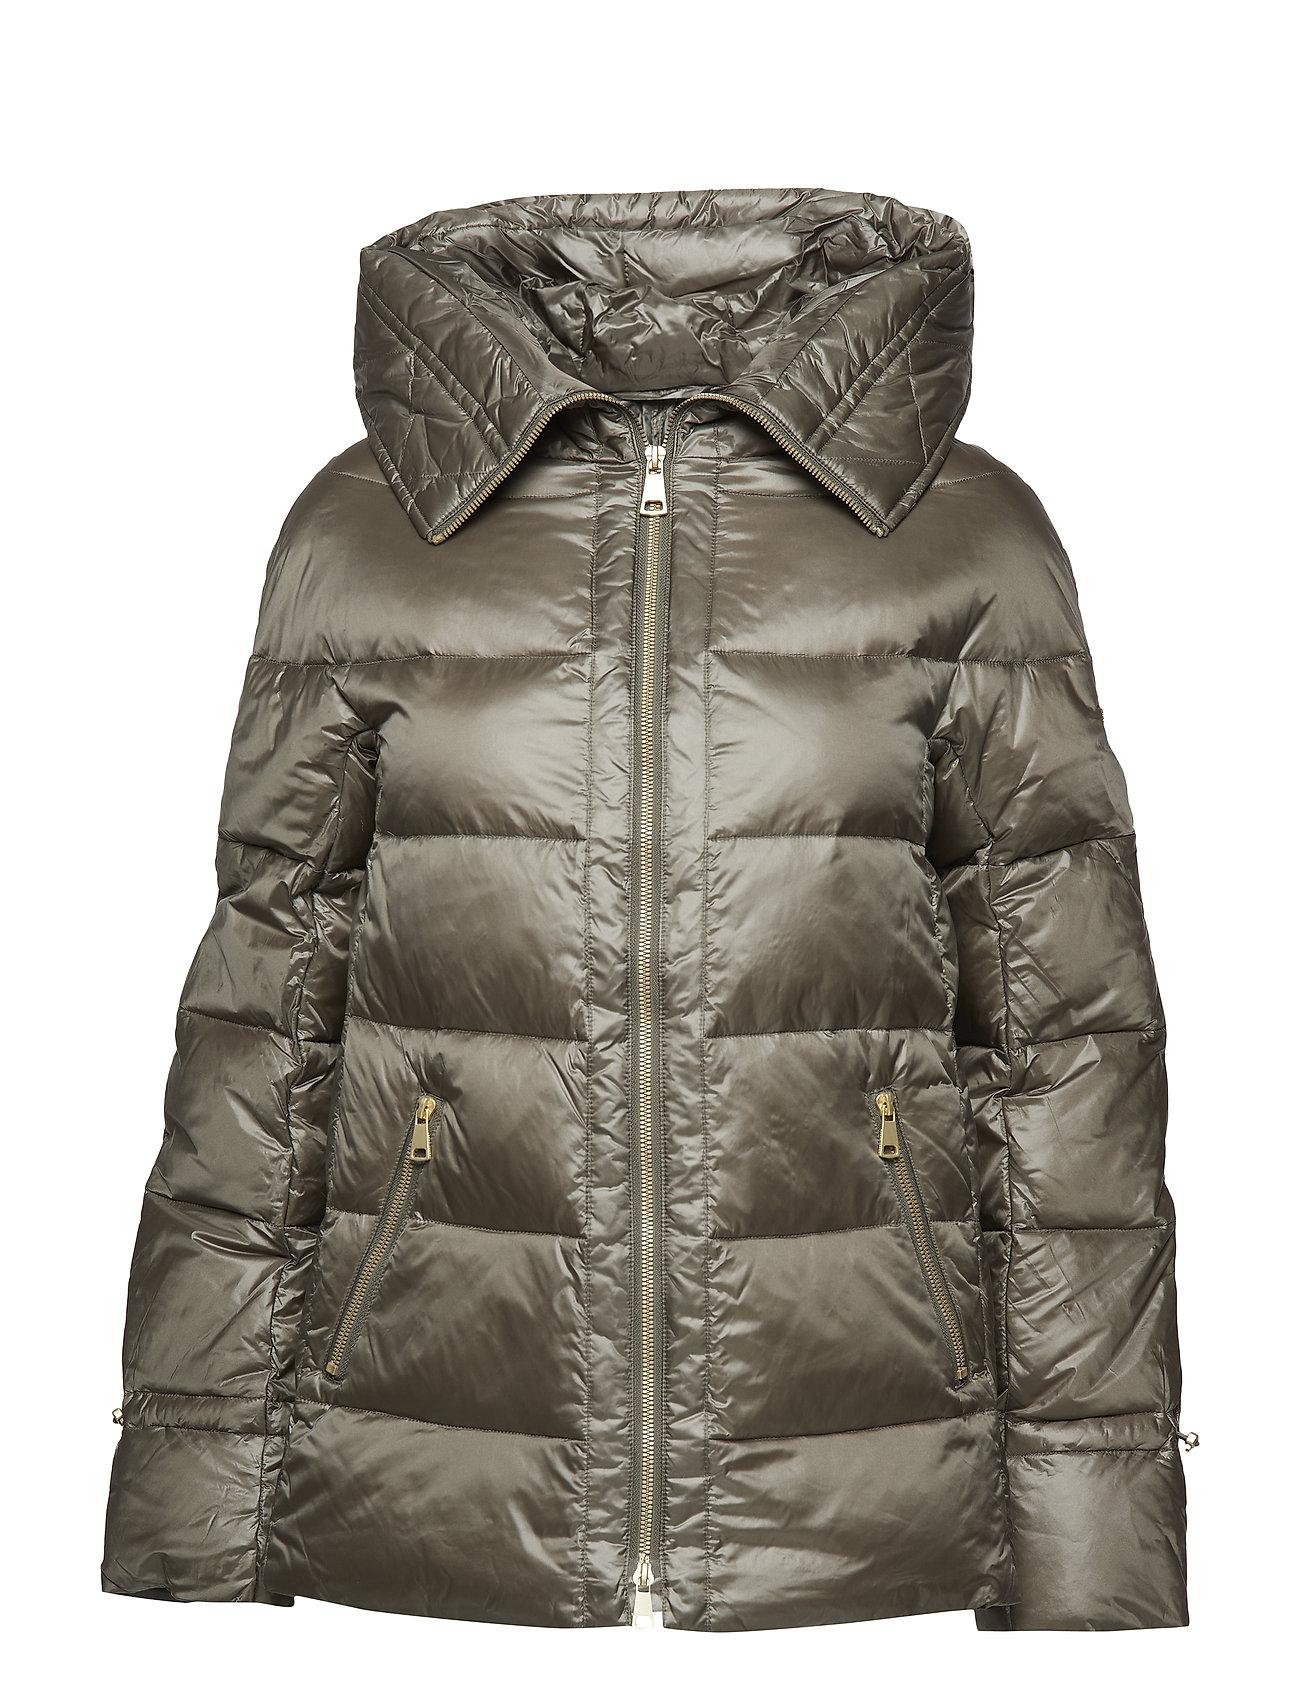 Outdoor Jacket No Wo - Gerry Weber Edition